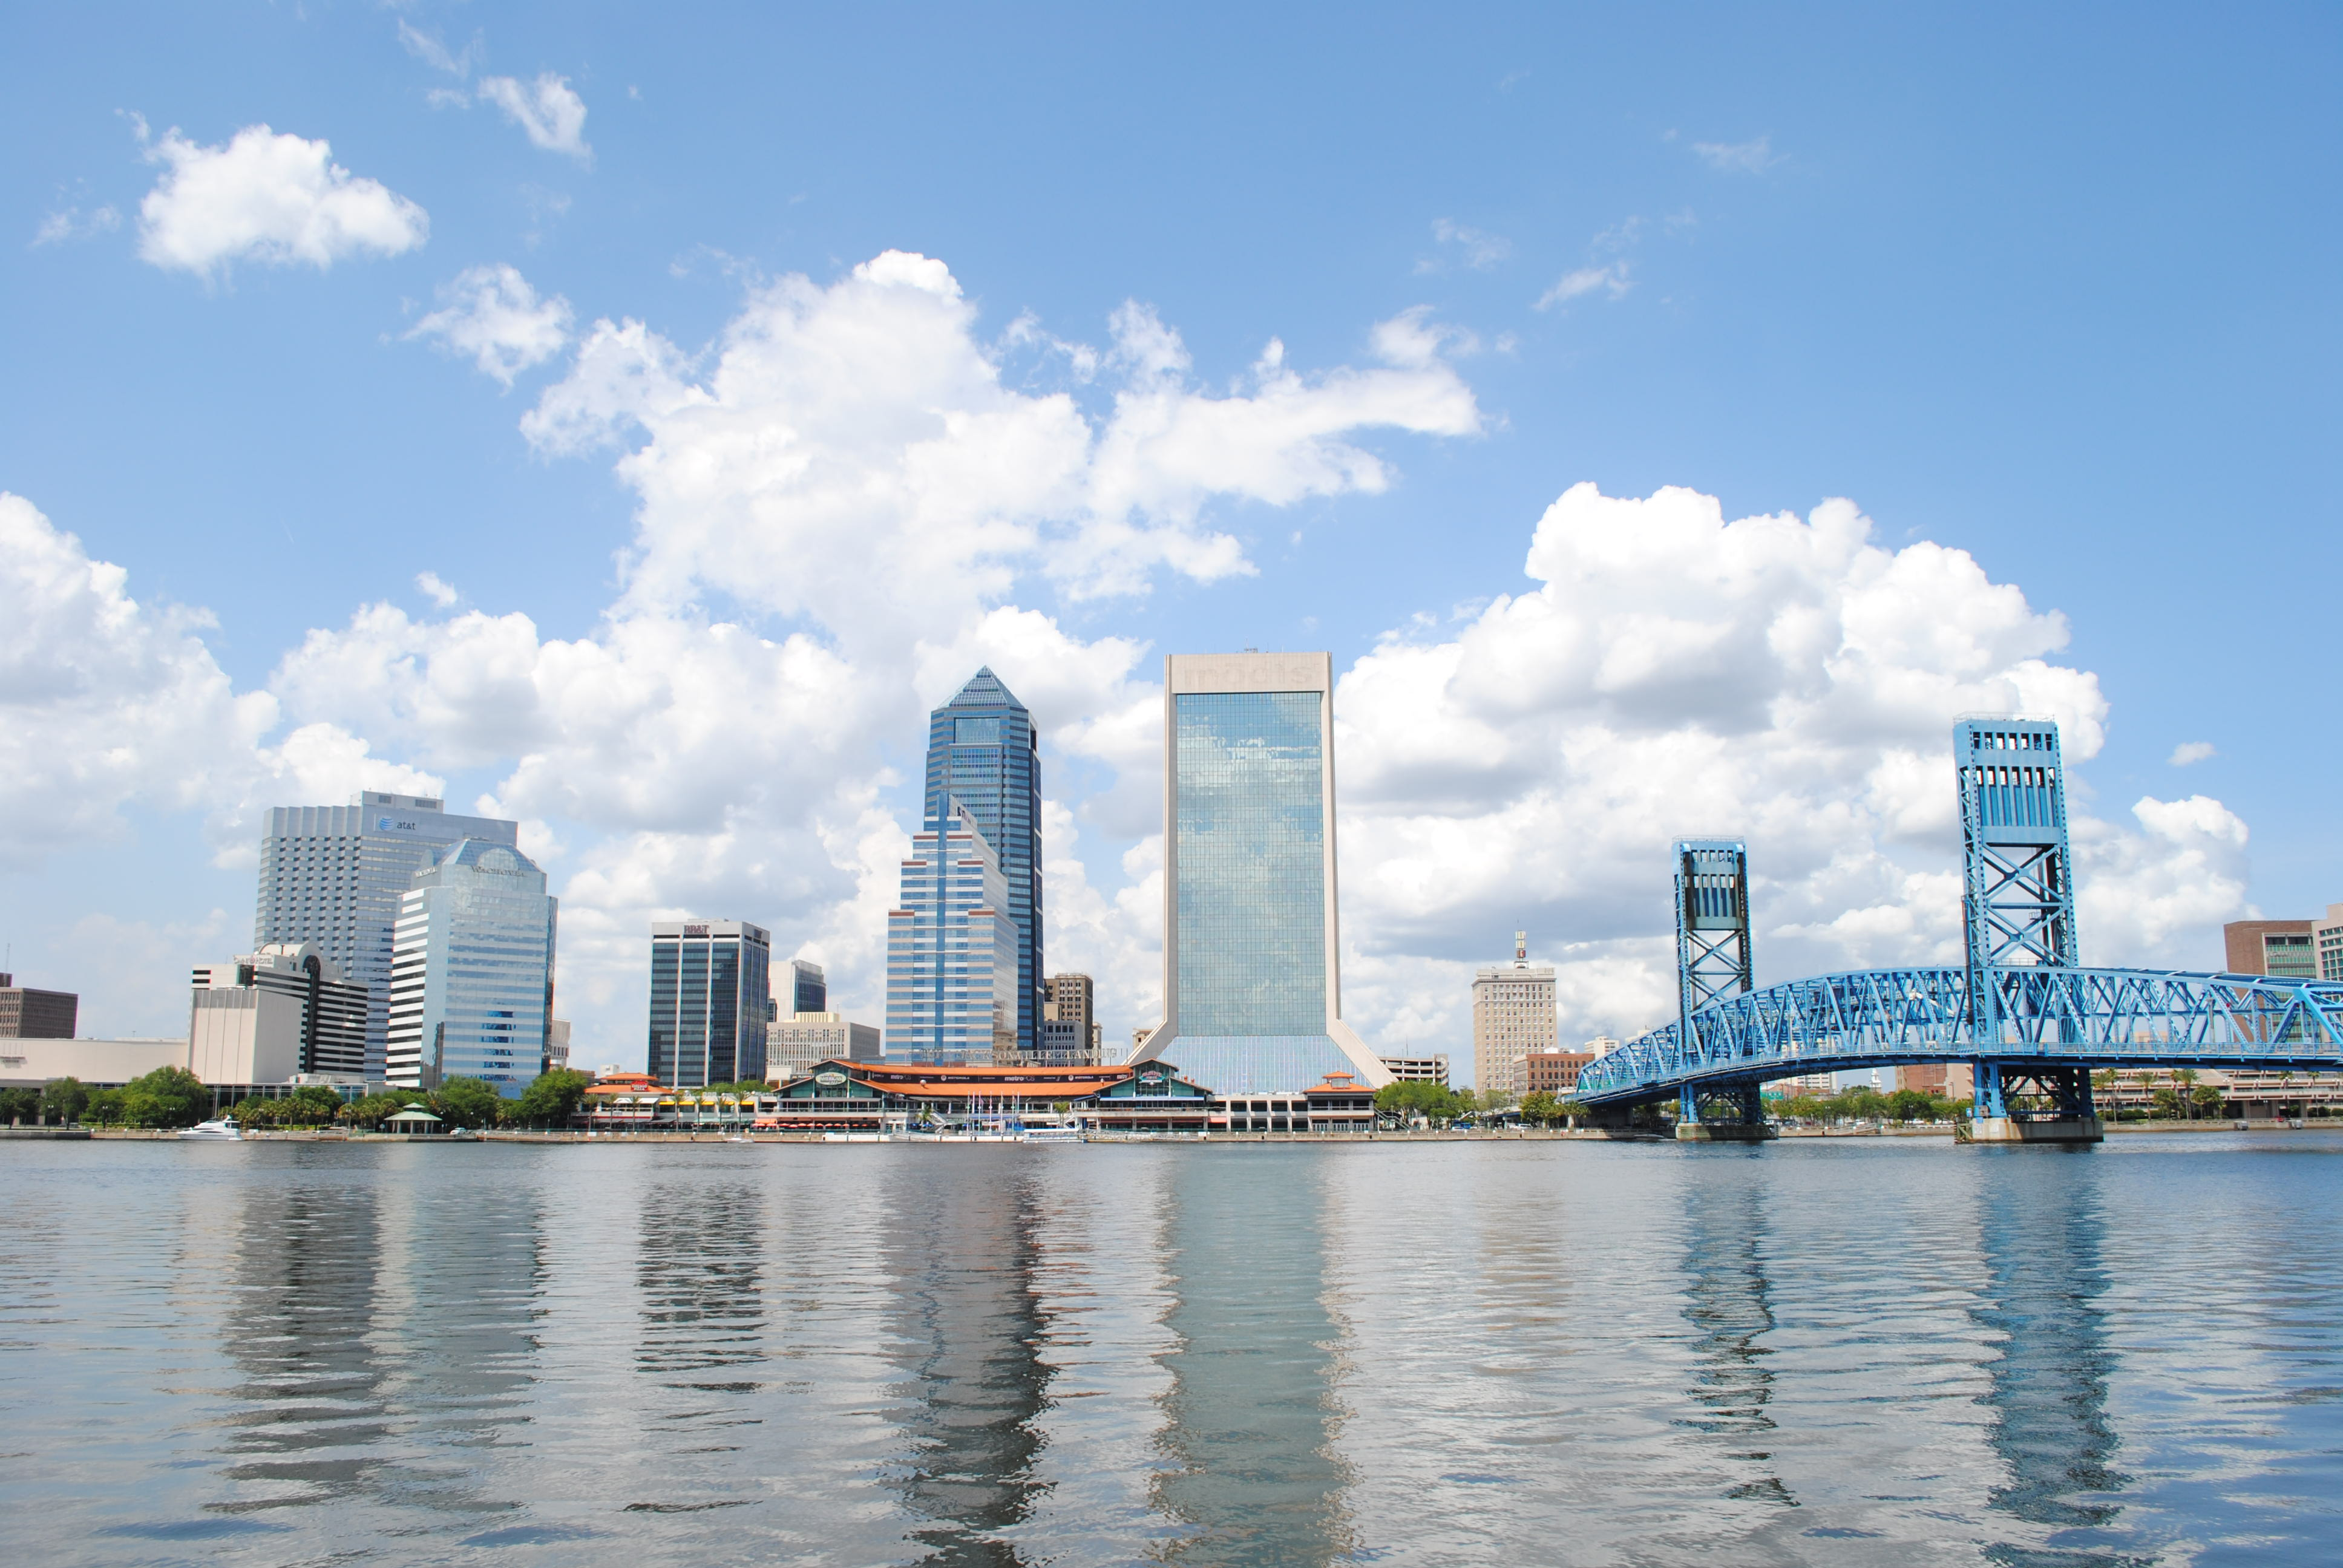 File:Jacksonville, Florida - downtown.jpg - Wikimedia Commons